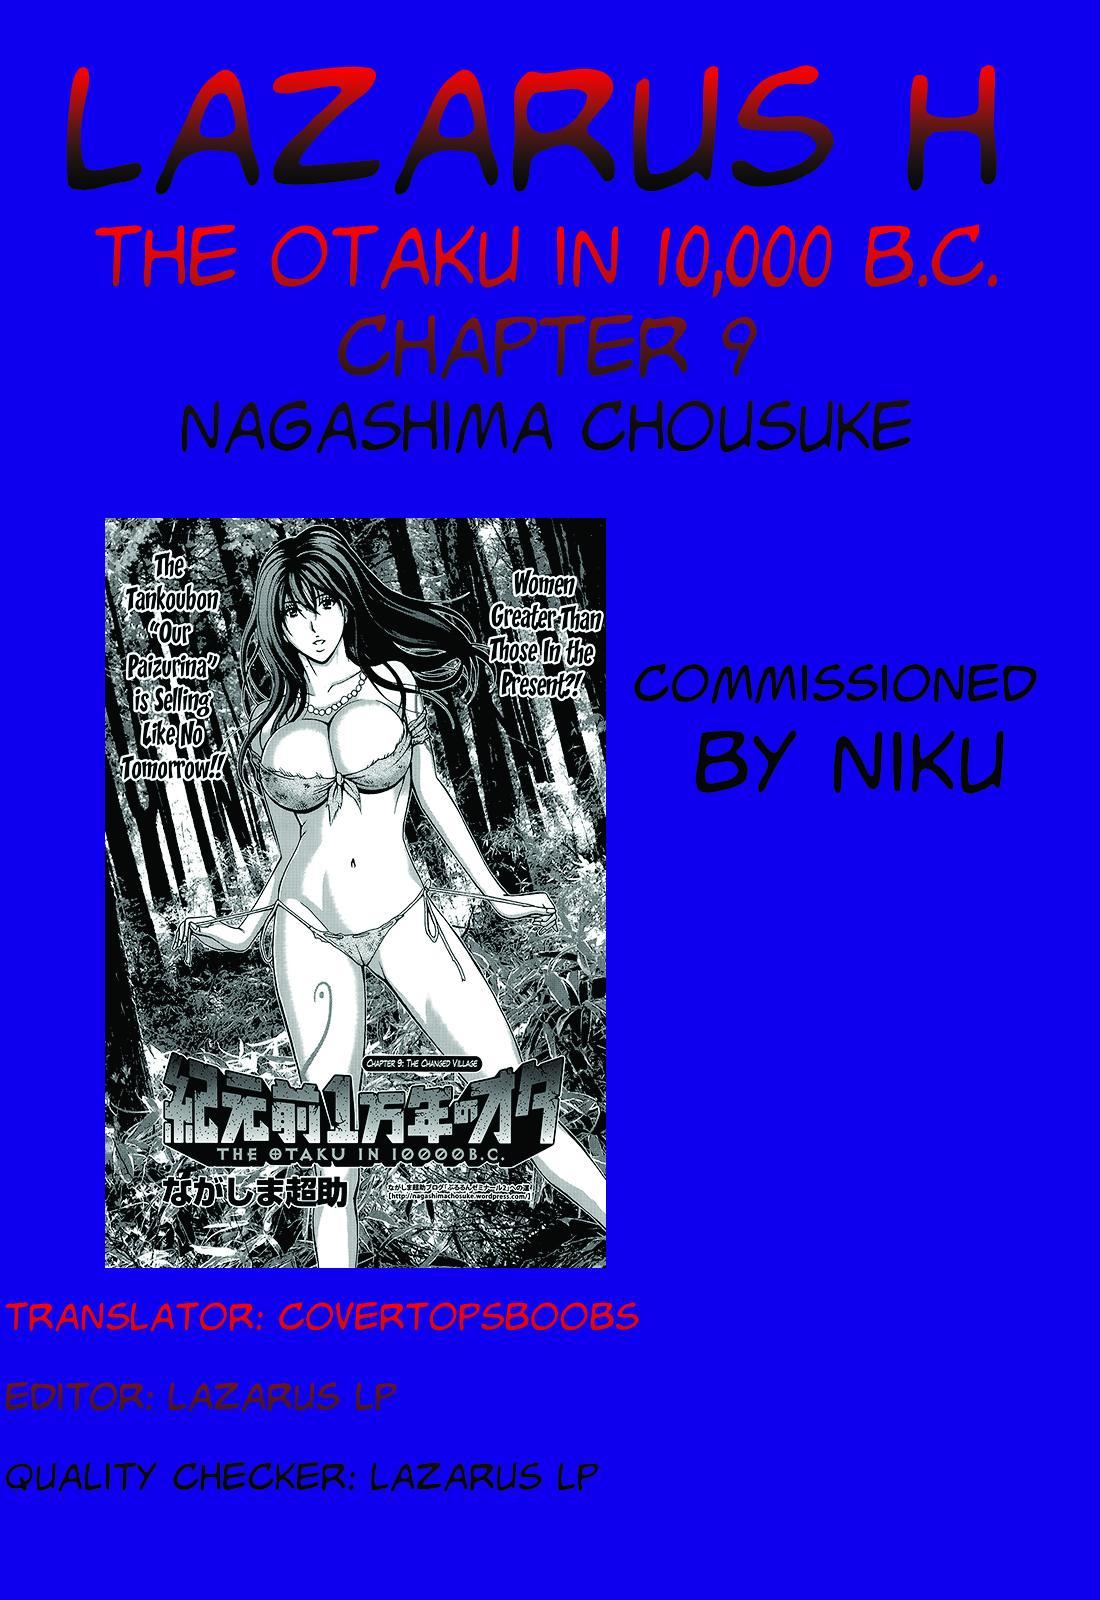 Kigenzen 10000 Nen no Ota | The Otaku in 10,000 B.C. 174